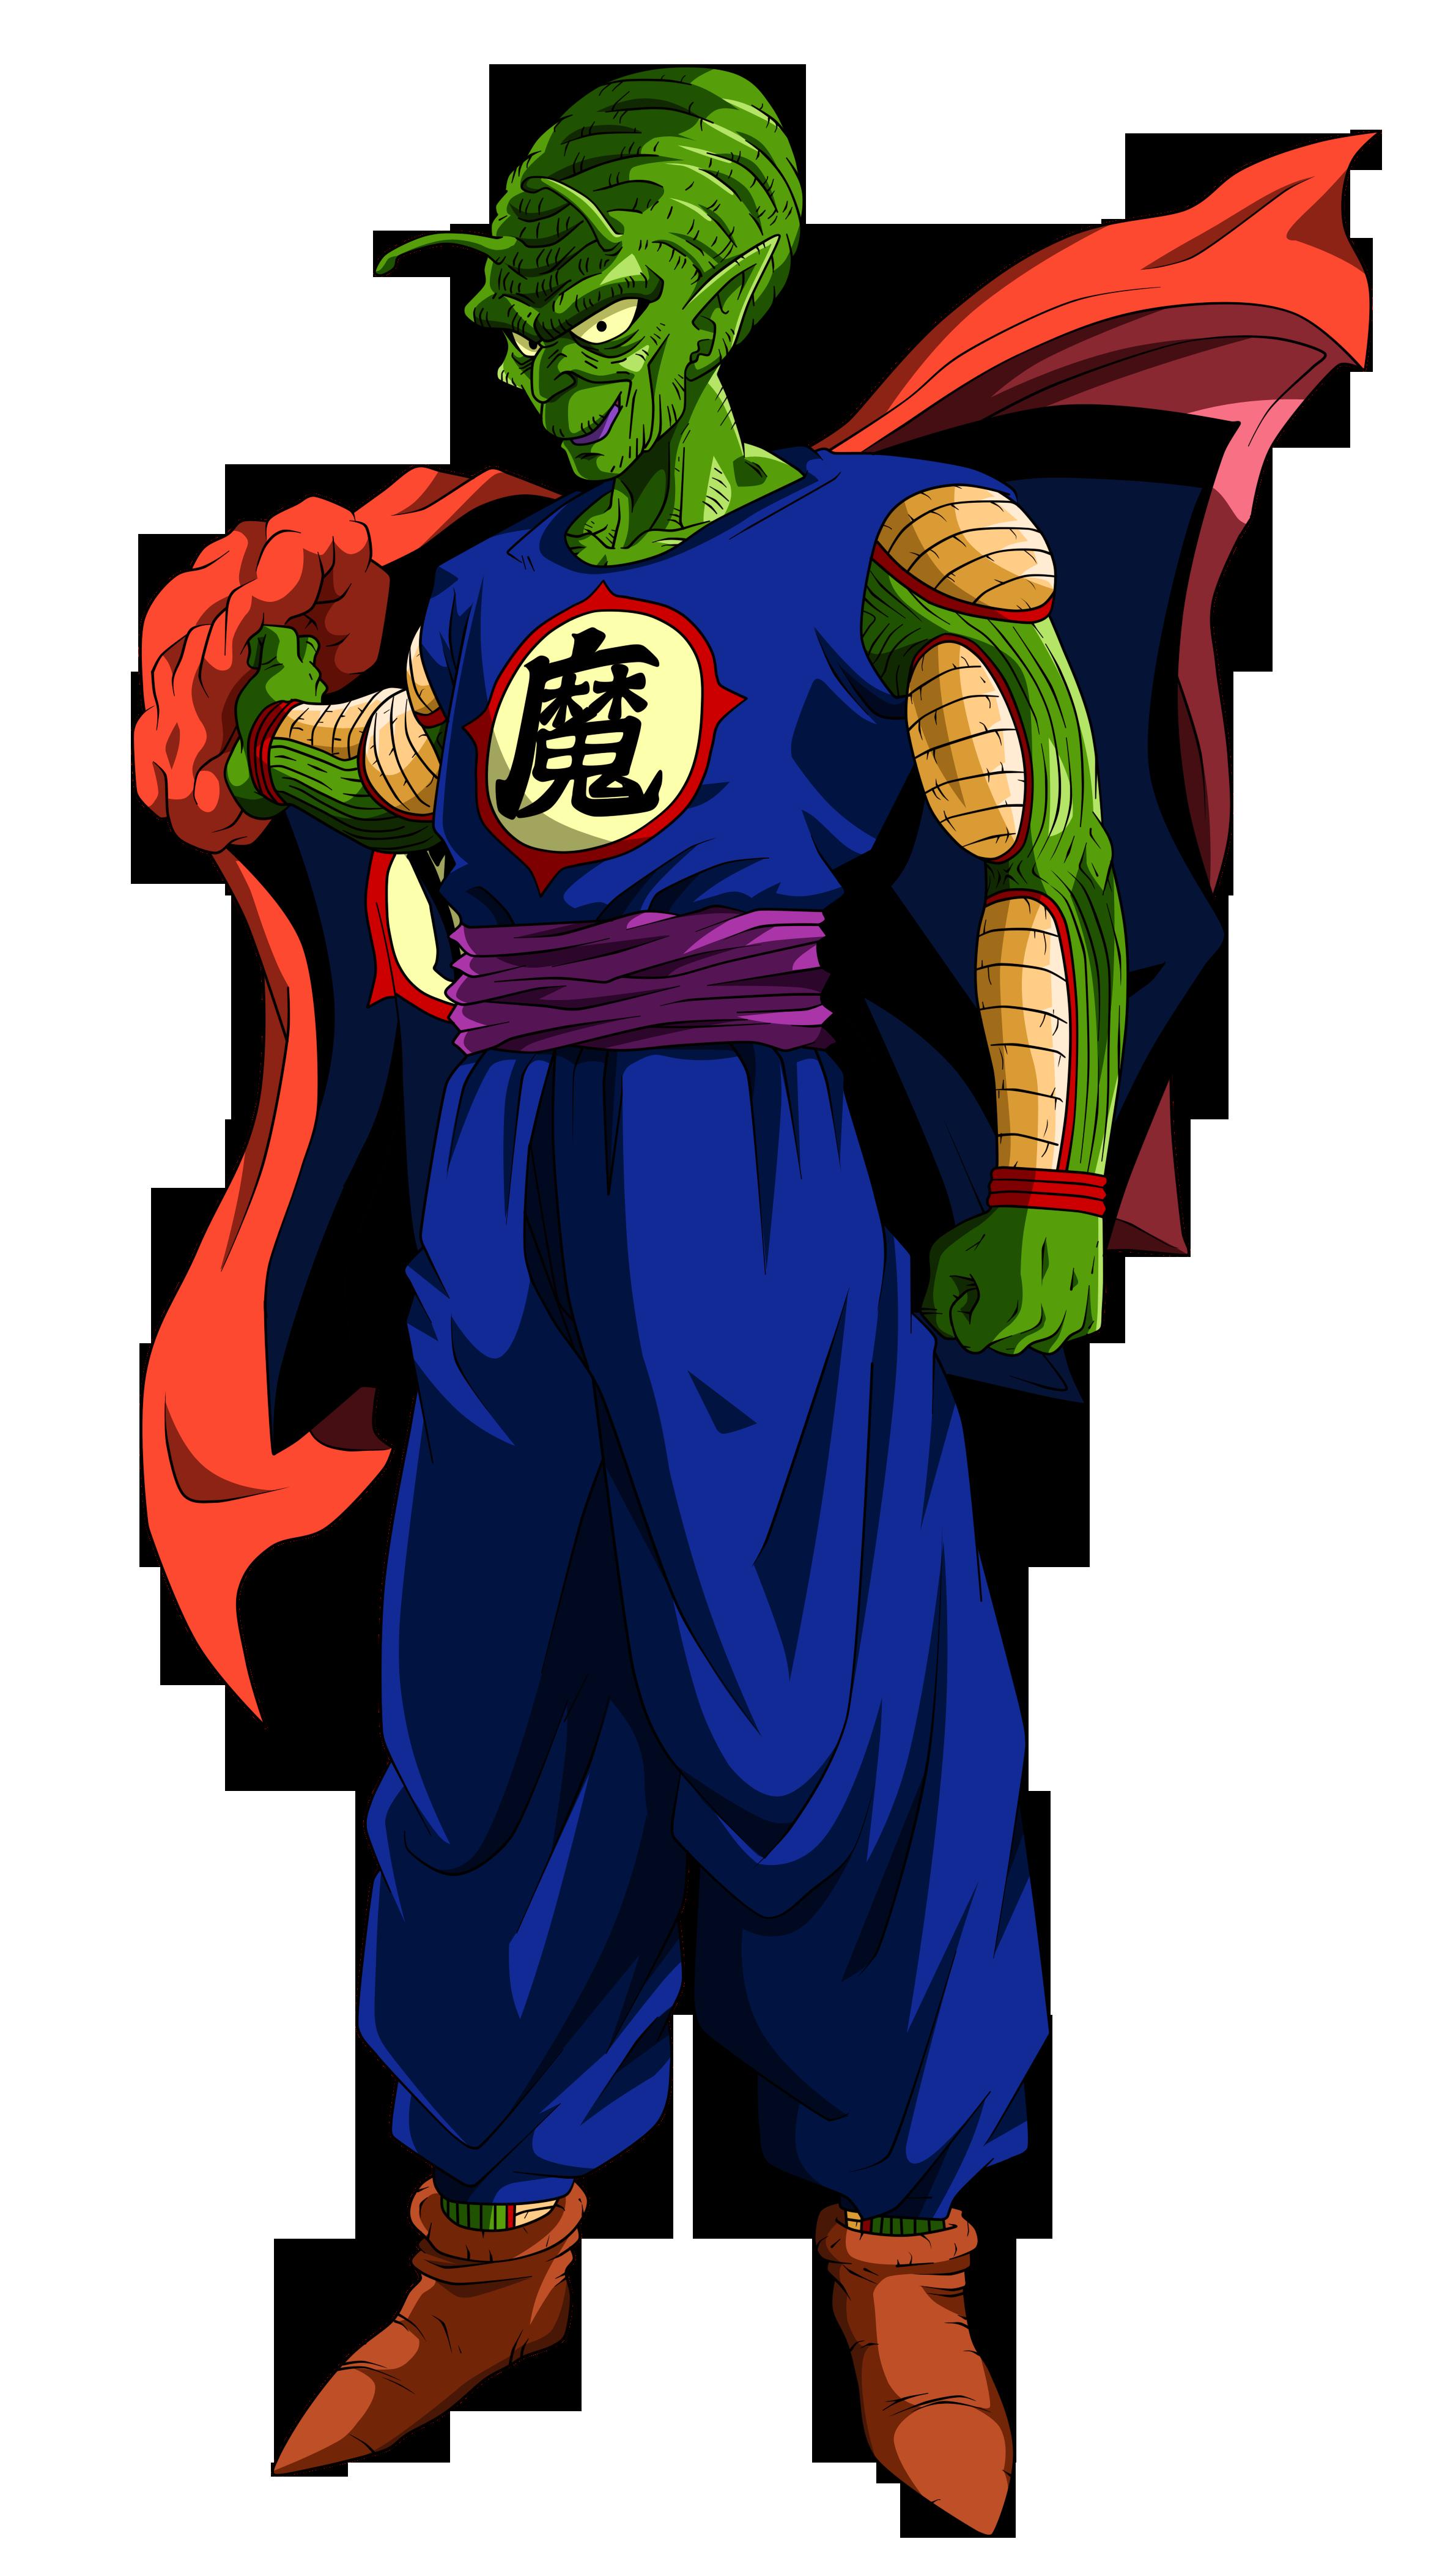 King Piccolo - Villains Wiki - villains, bad guys, comic ...